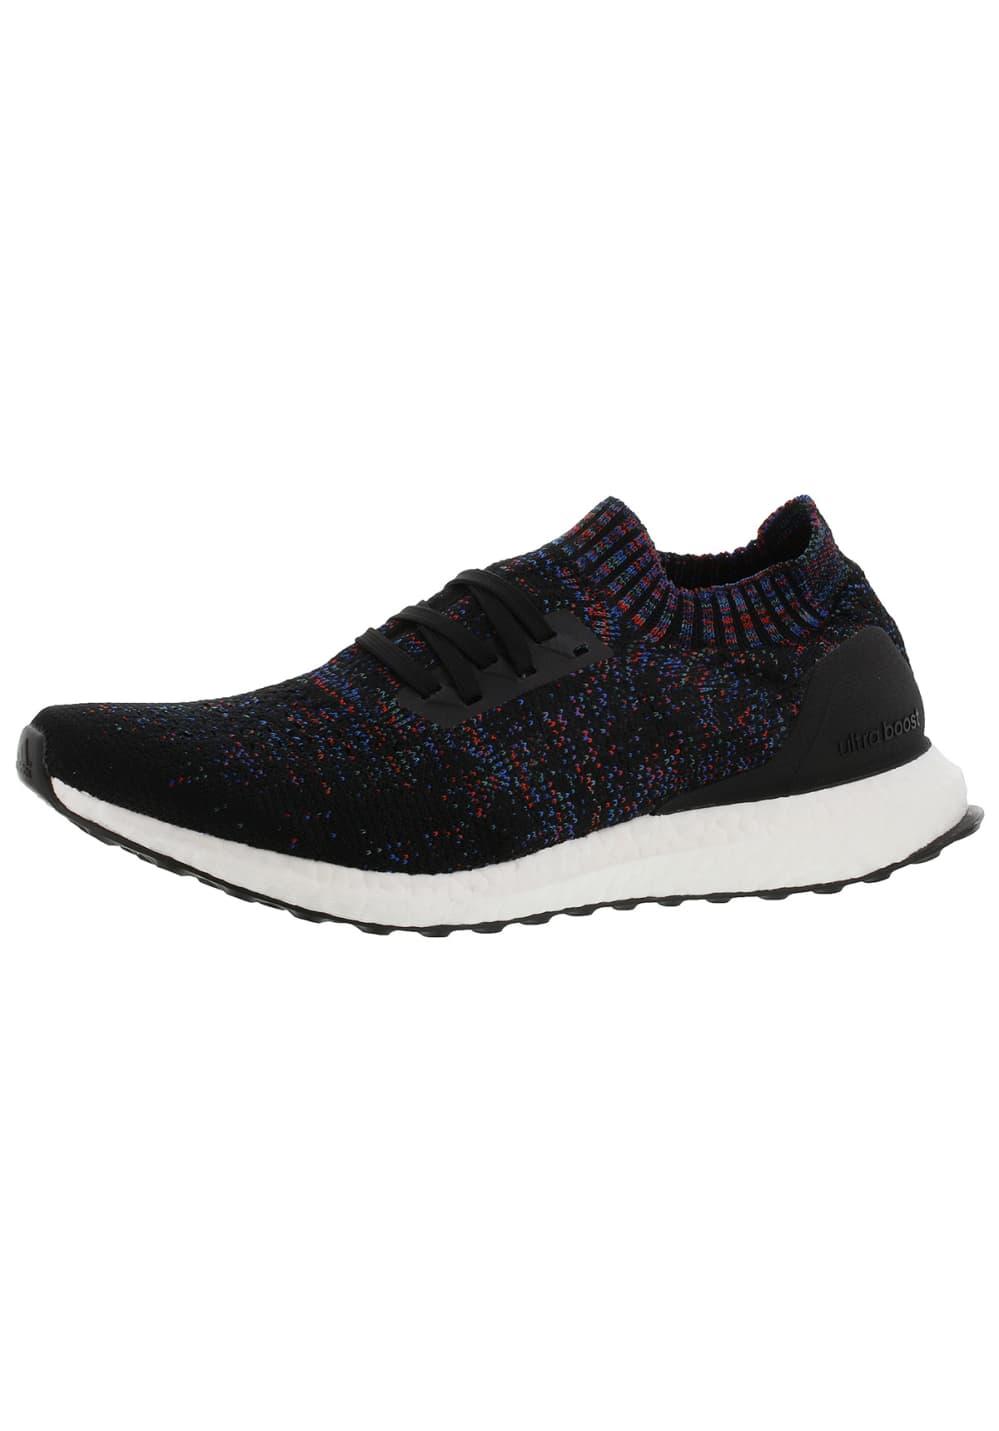 regarder 2a99a 3906d adidas Ultra Boost Uncaged - Chaussures running pour Homme - Noir